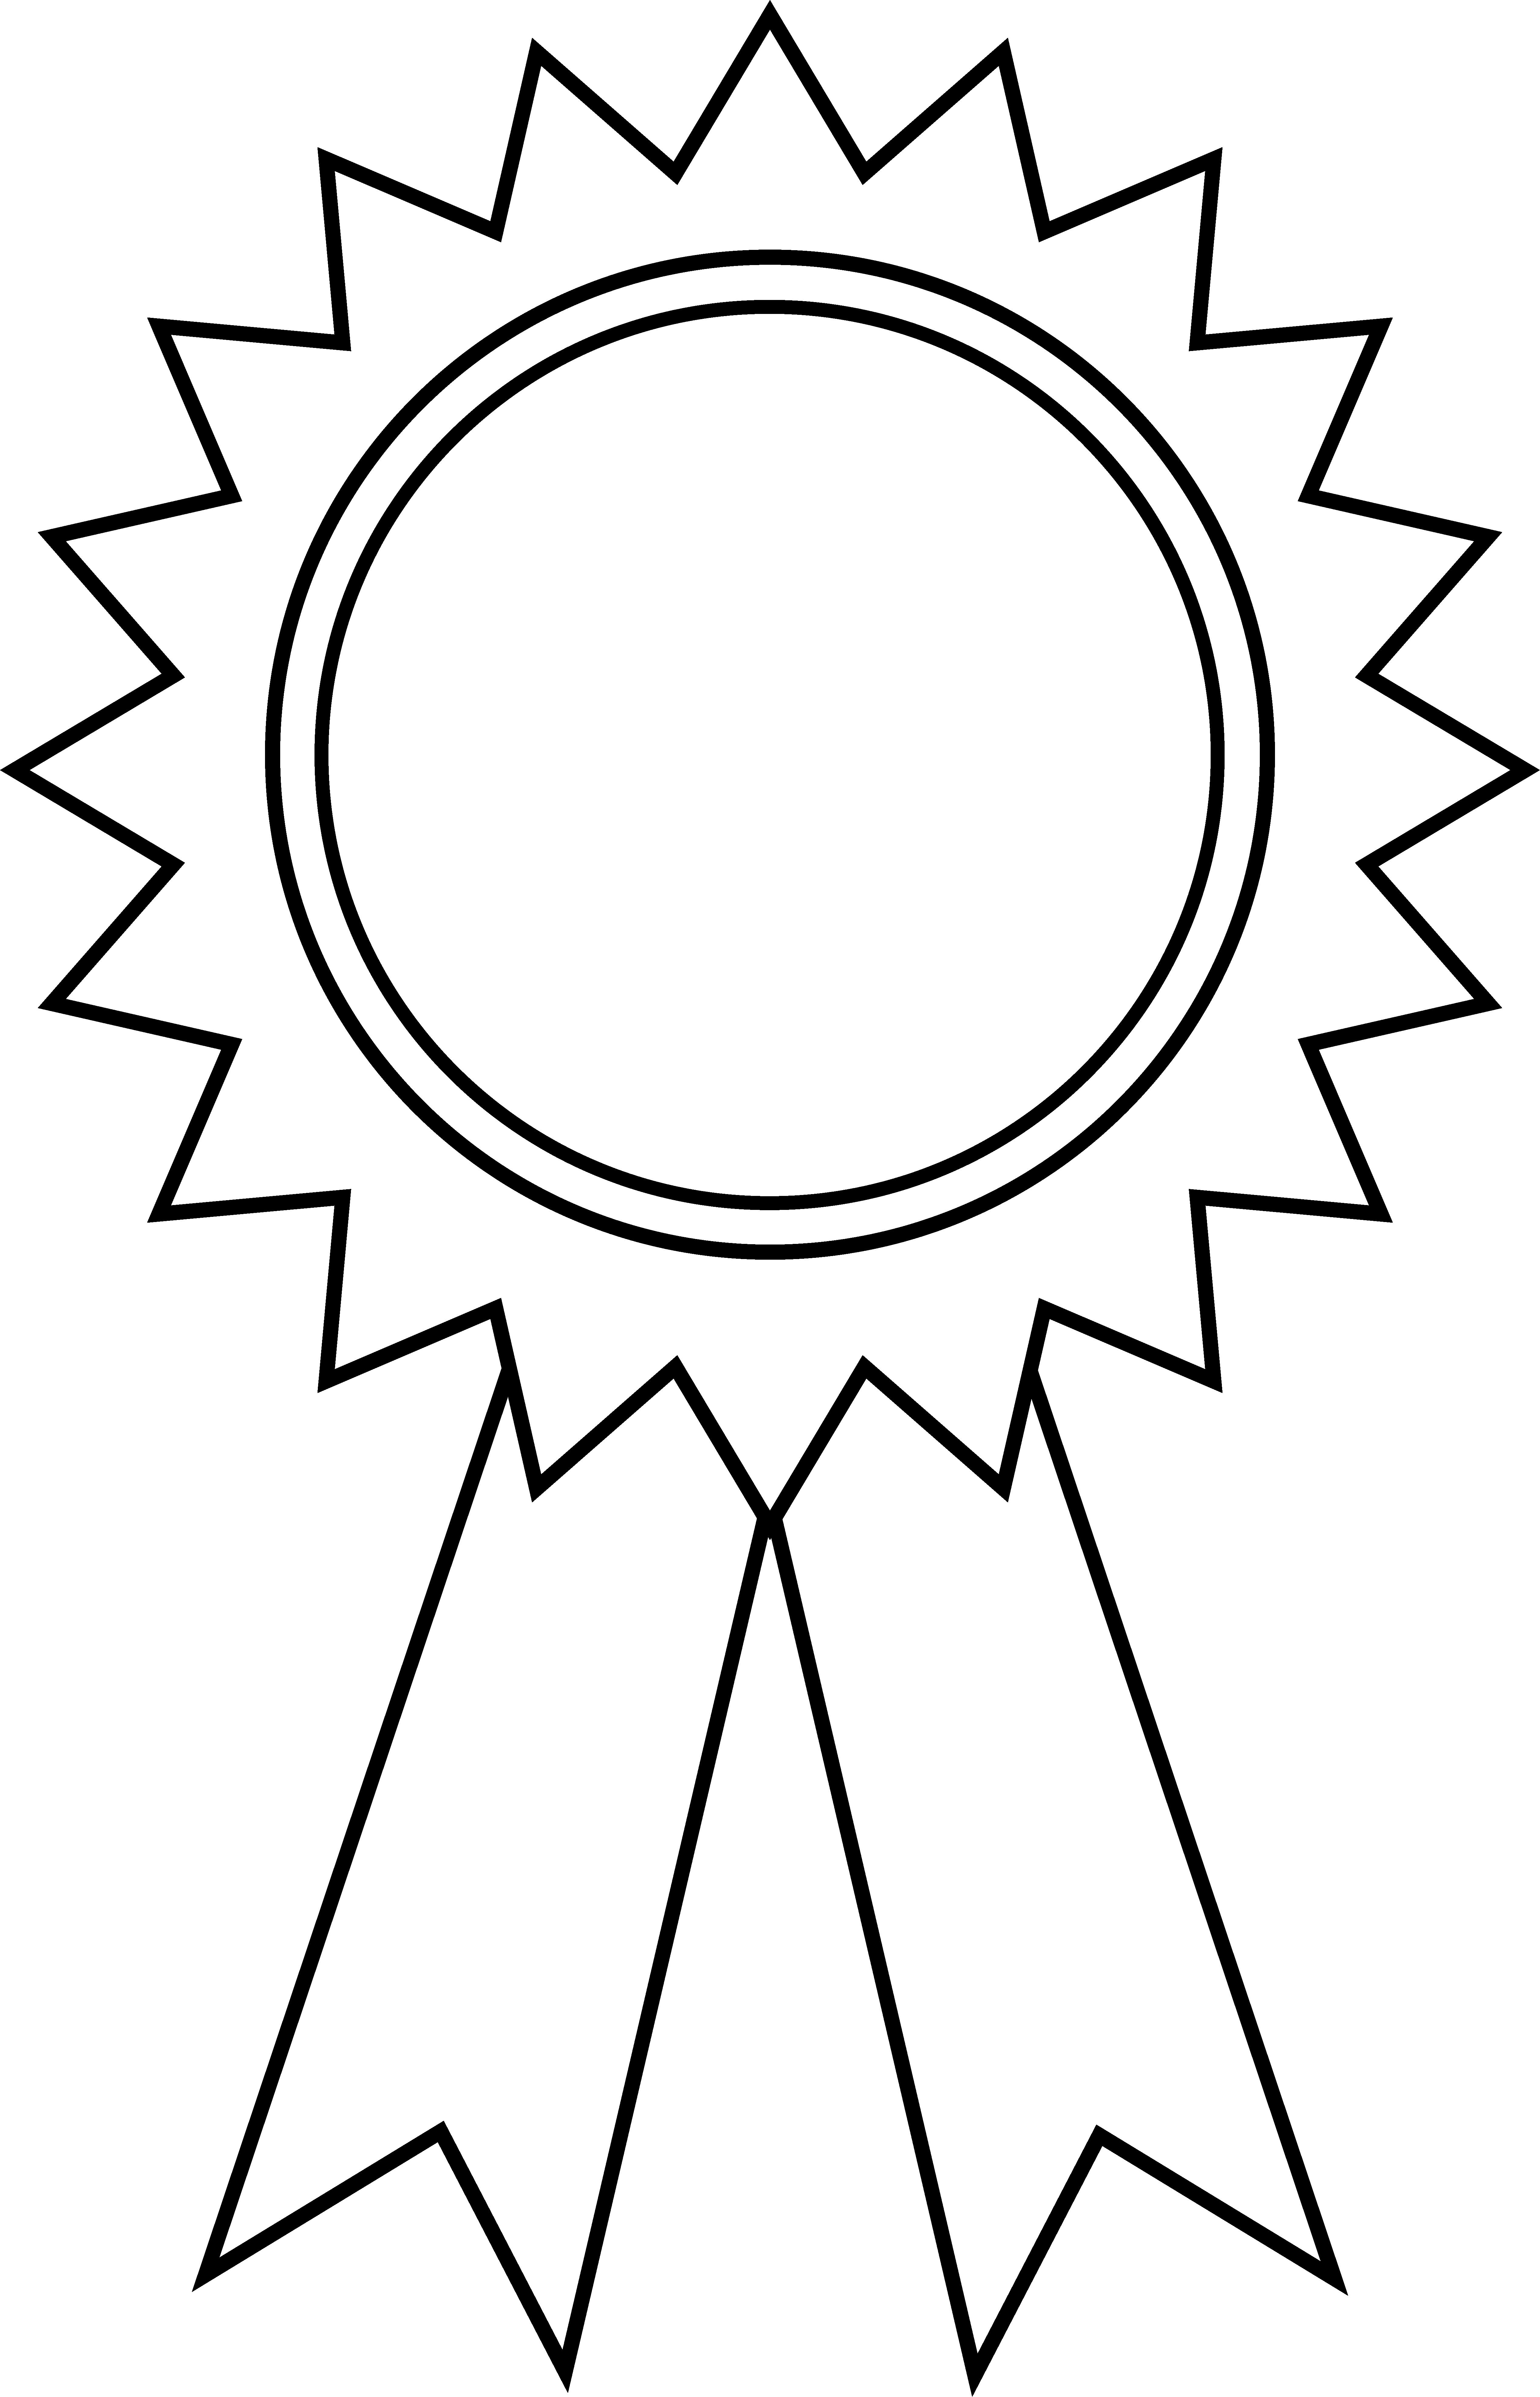 Clback dog clipart svg freeuse 30+ Award Ribbon Clipart | ClipartLook svg freeuse